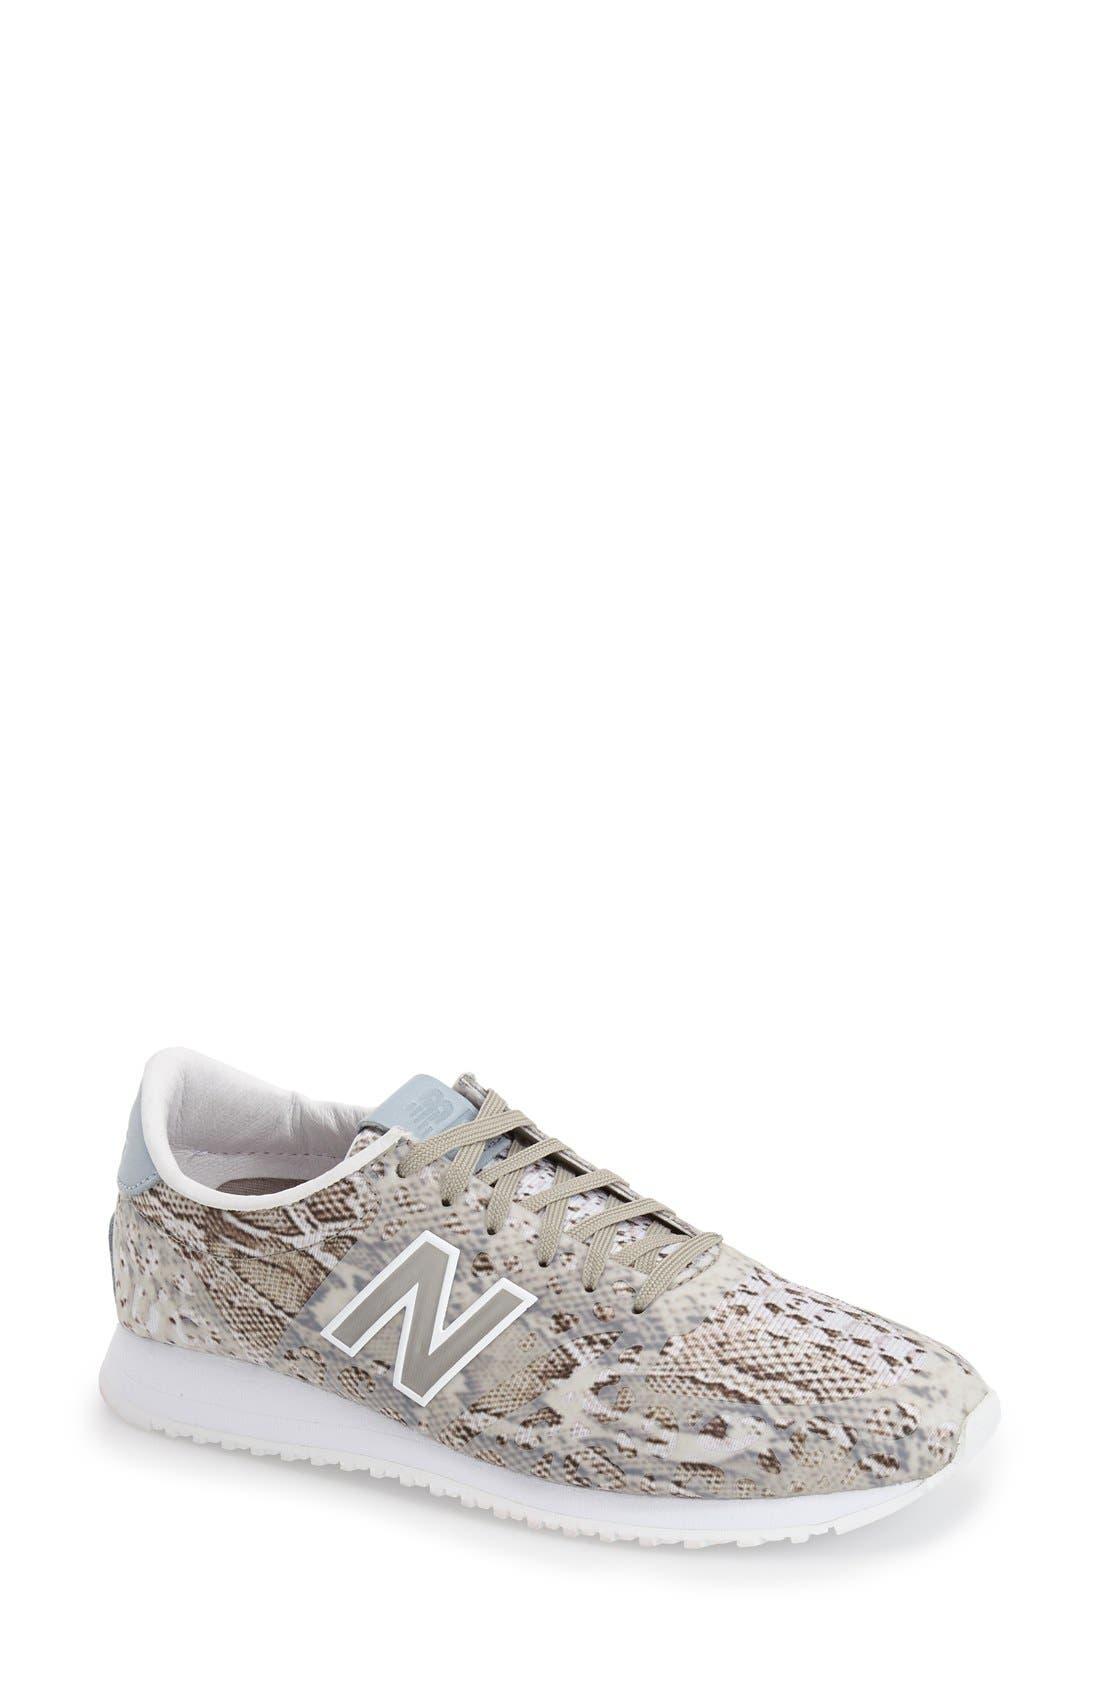 Main Image - New Balance '420 - Tokyo Design Studio Collection' Sneaker (Women)